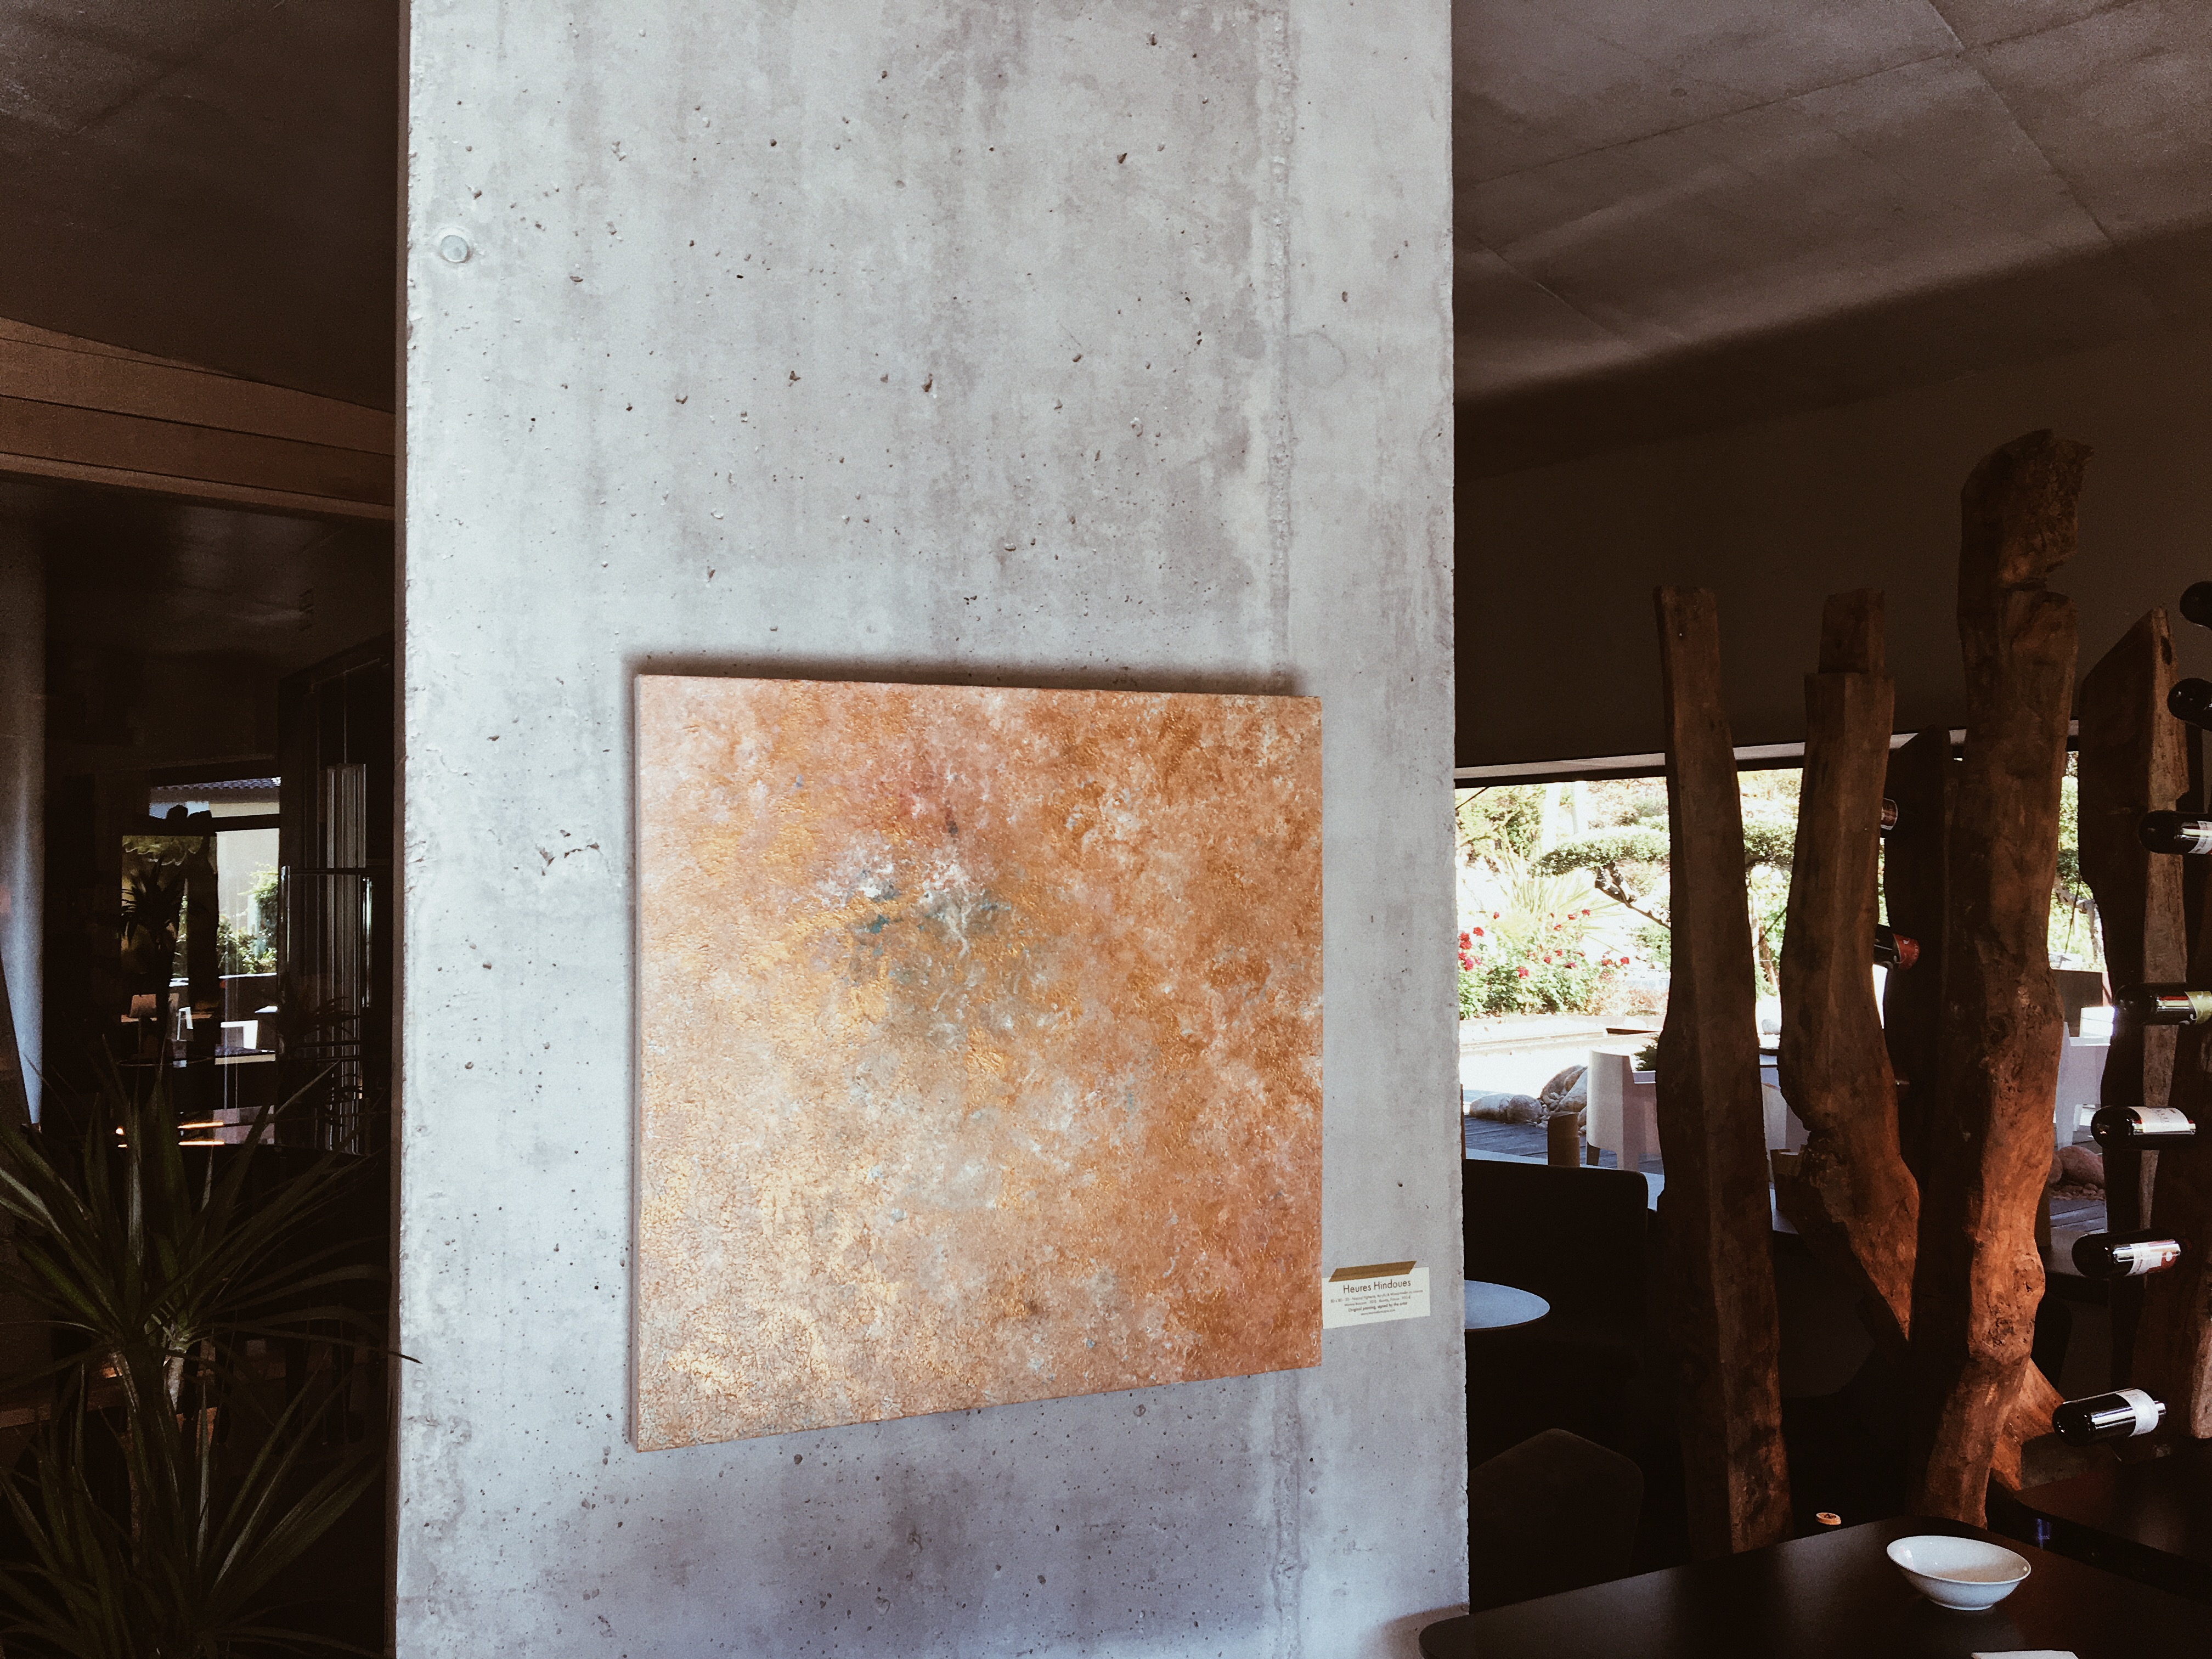 Marine Bonzom - Artiste Peintre Biarritz - Home - Heures Hindoues - Viura Hotel